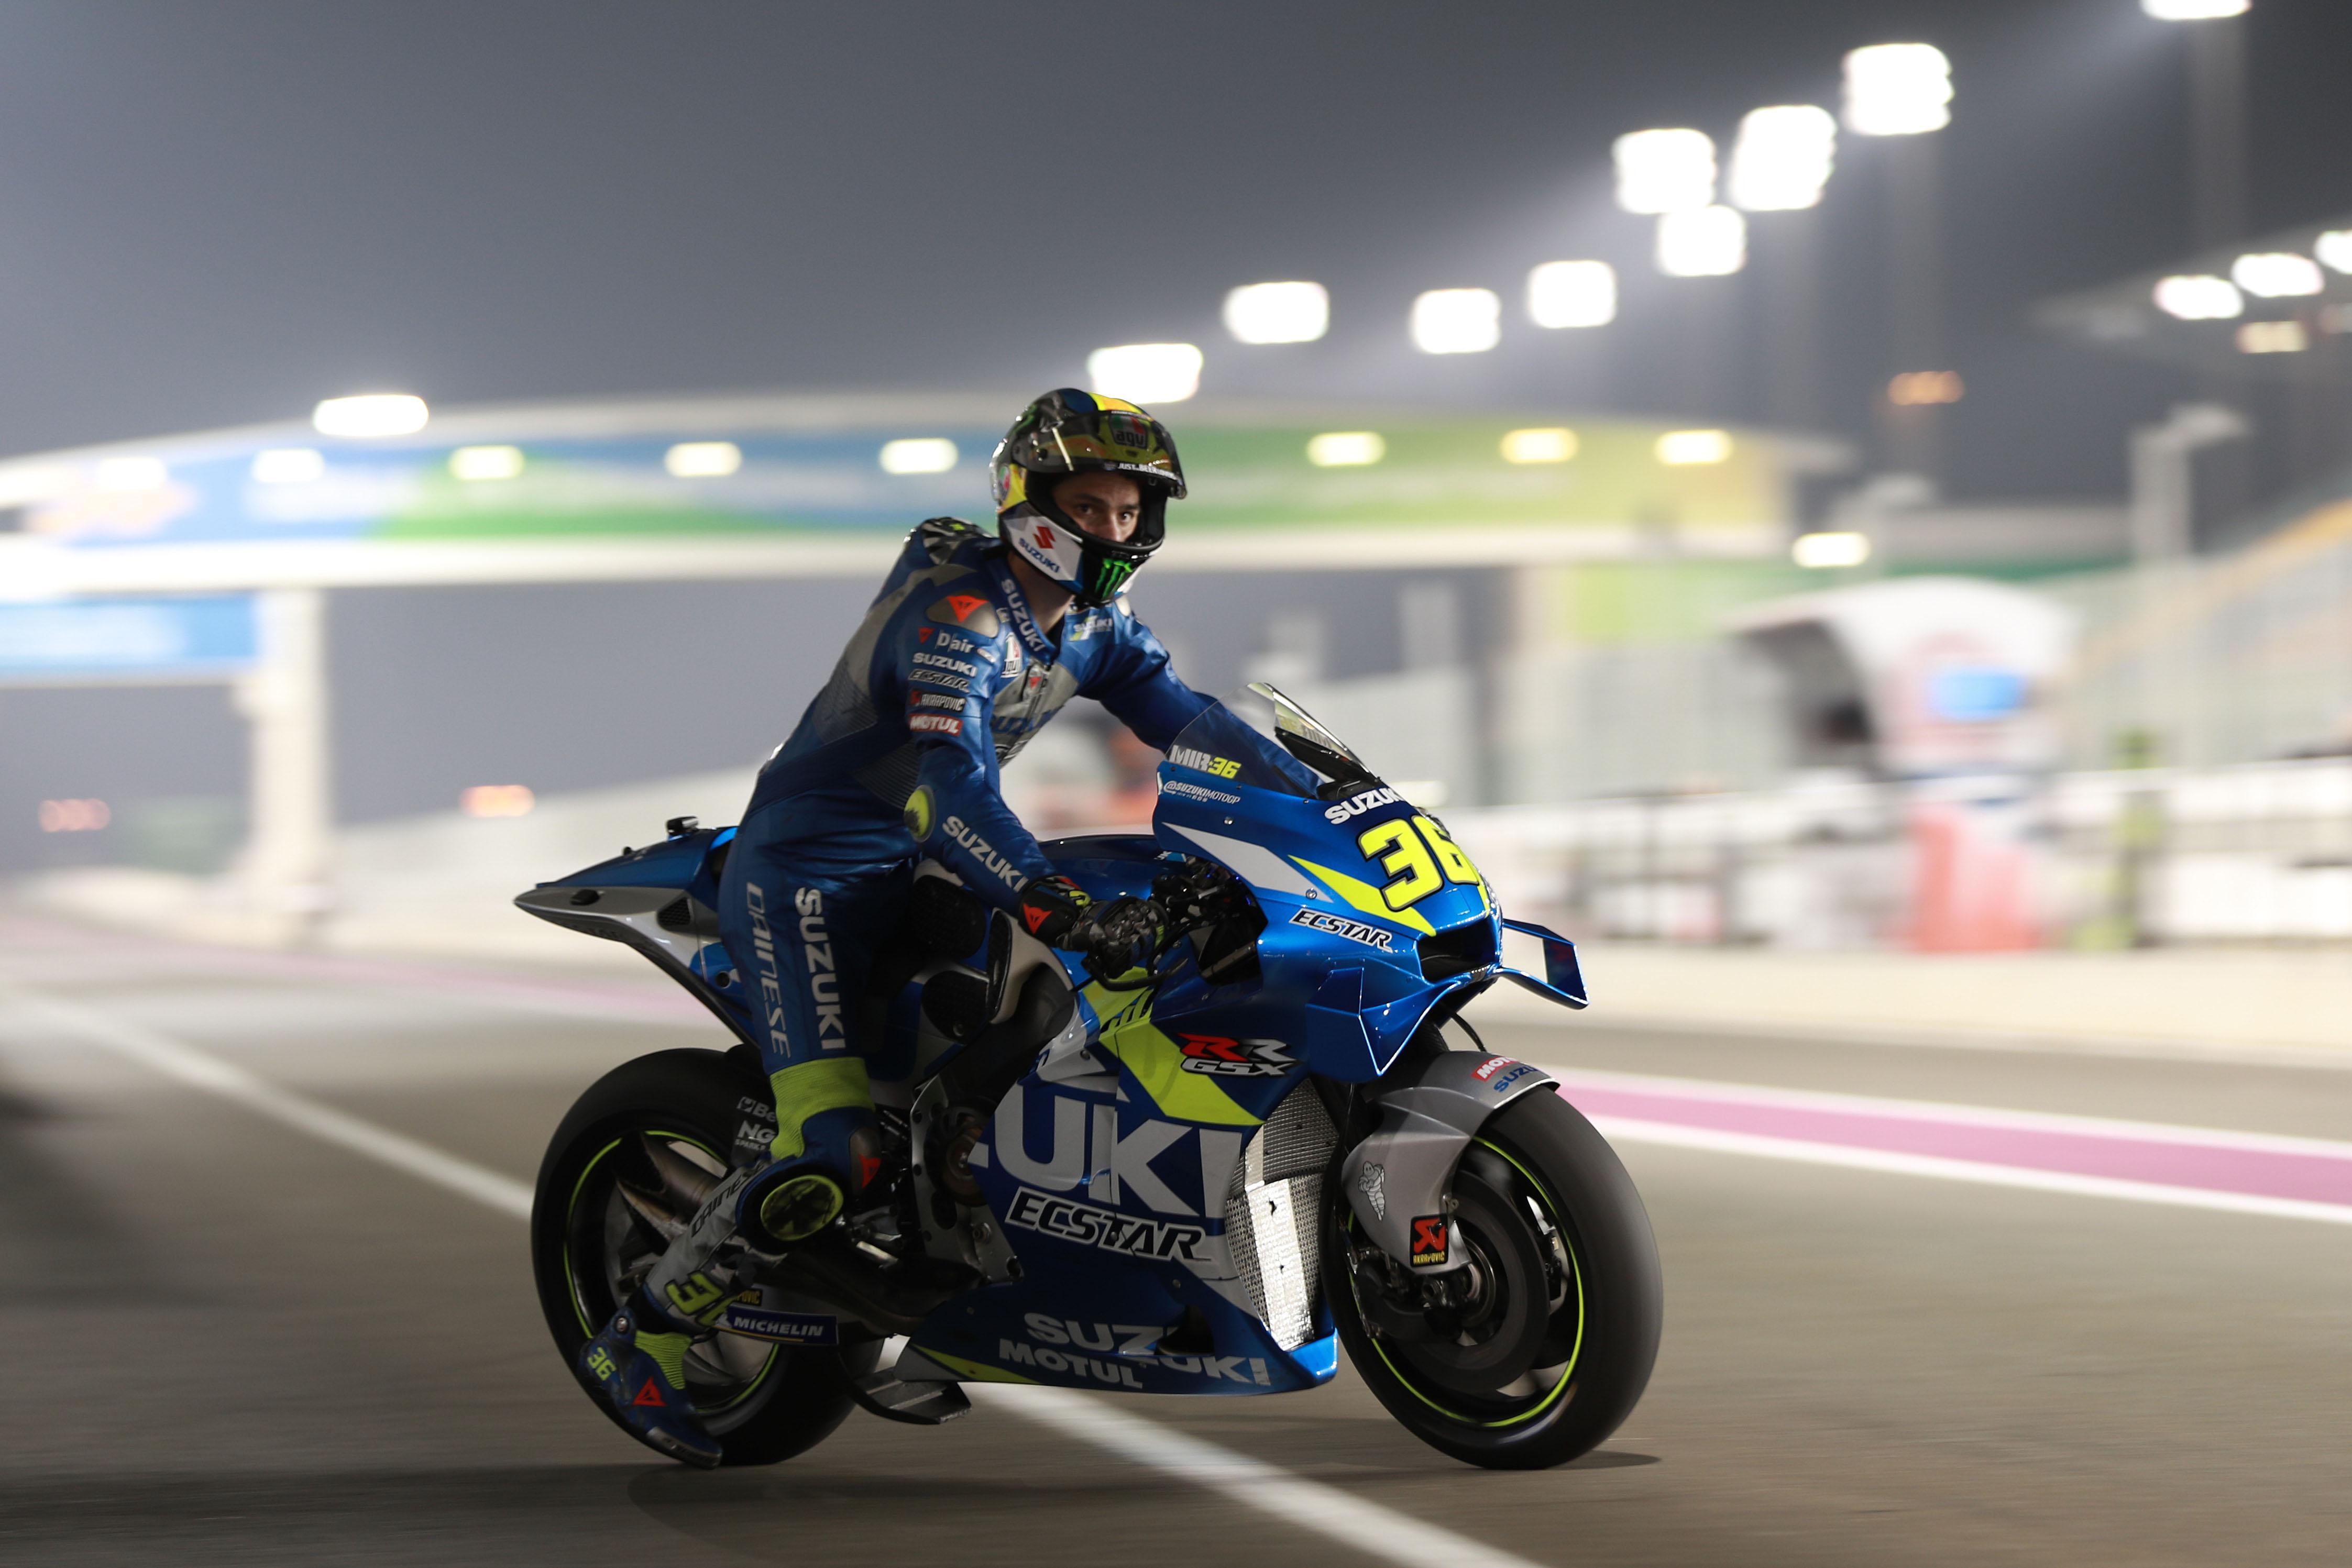 Joan Mir Suzuki MotoGP testing 2020